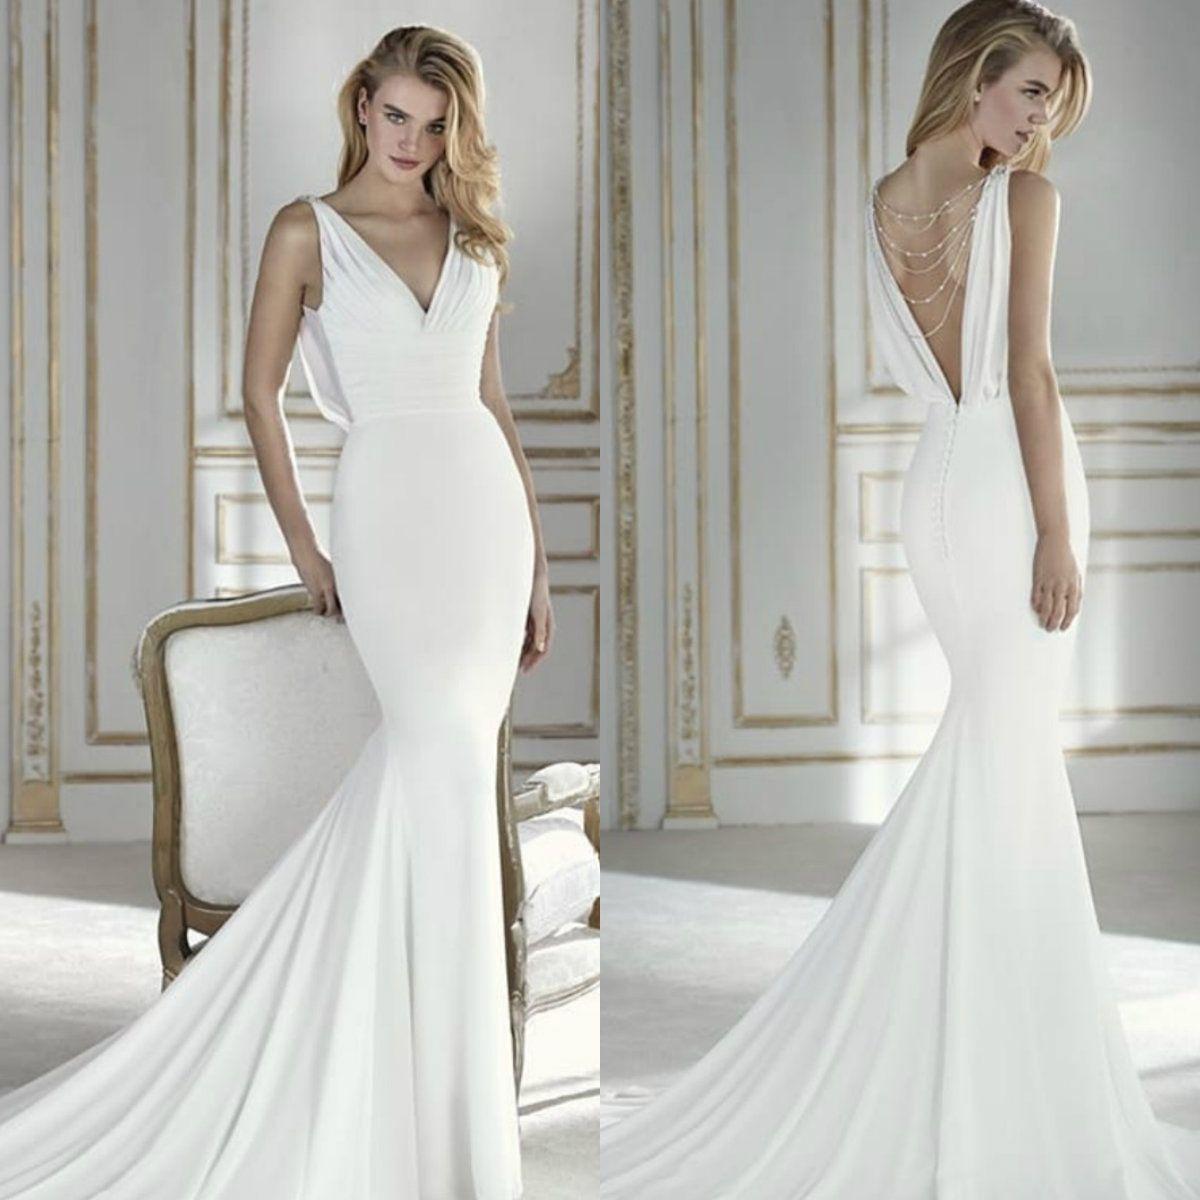 8aaf2e913f Elegant 2018 Mermaid Wedding Dress V Neck Sexy Backless Beading Design  Simple Custom Made Bridal Gowns